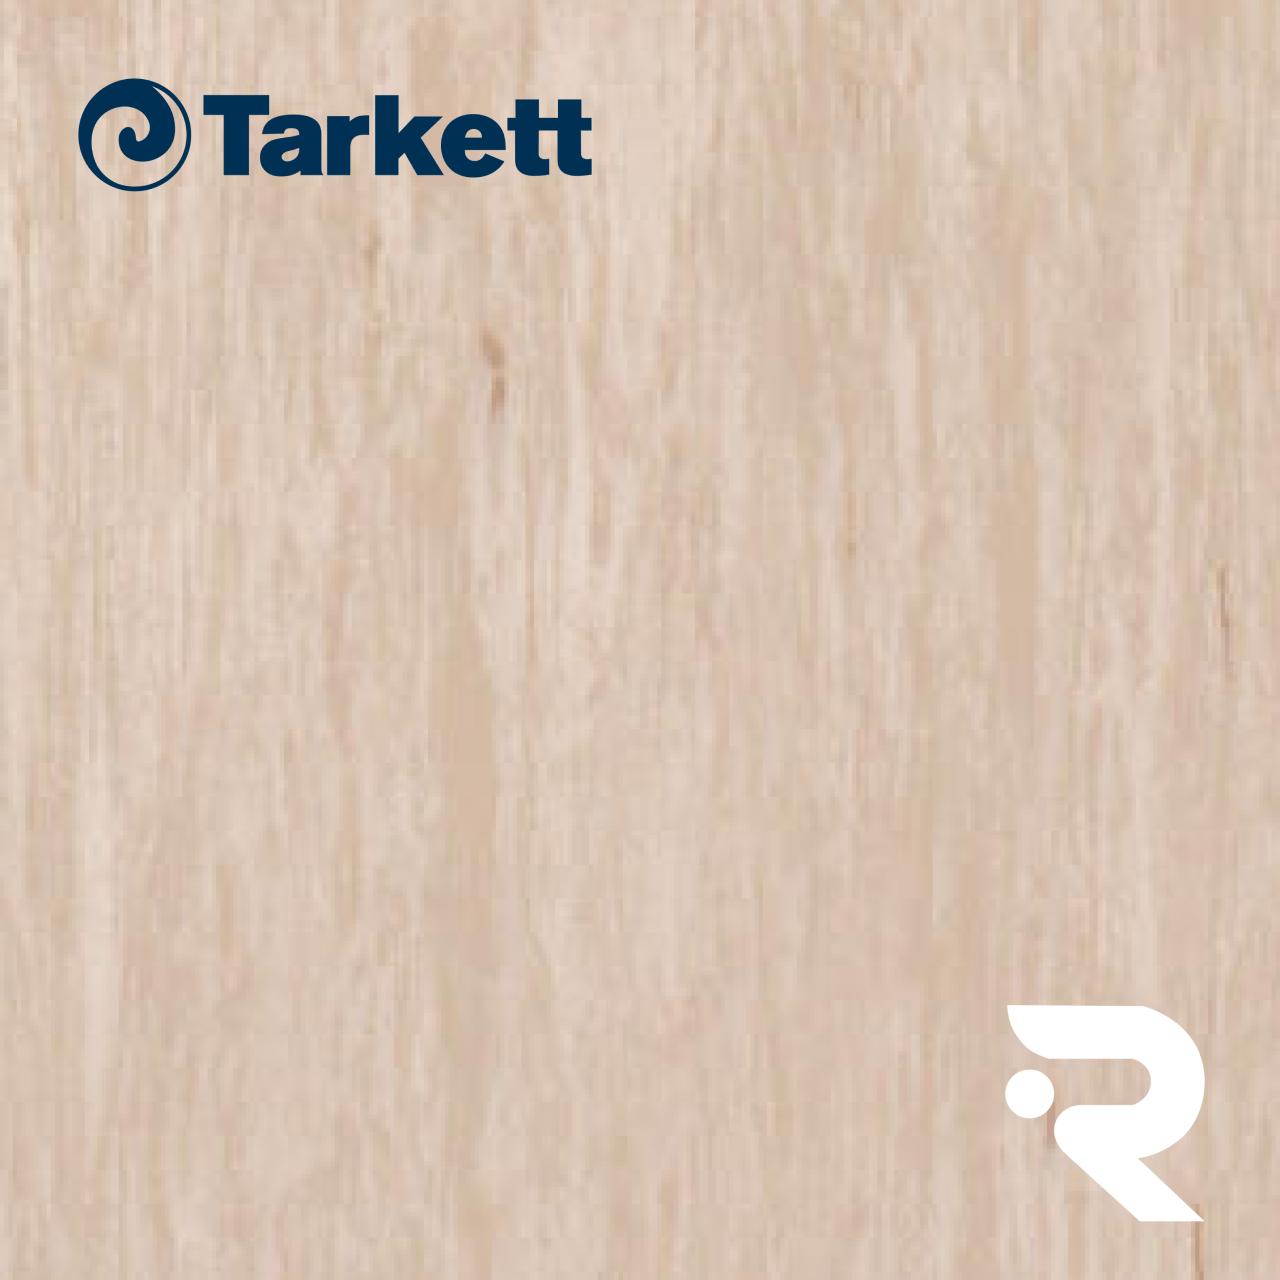 🏫 Гомогенный линолеум Tarkett | Standard LIGHT BEIGE 0479 | Standard Plus 2.0 mm | 610 х 610 мм